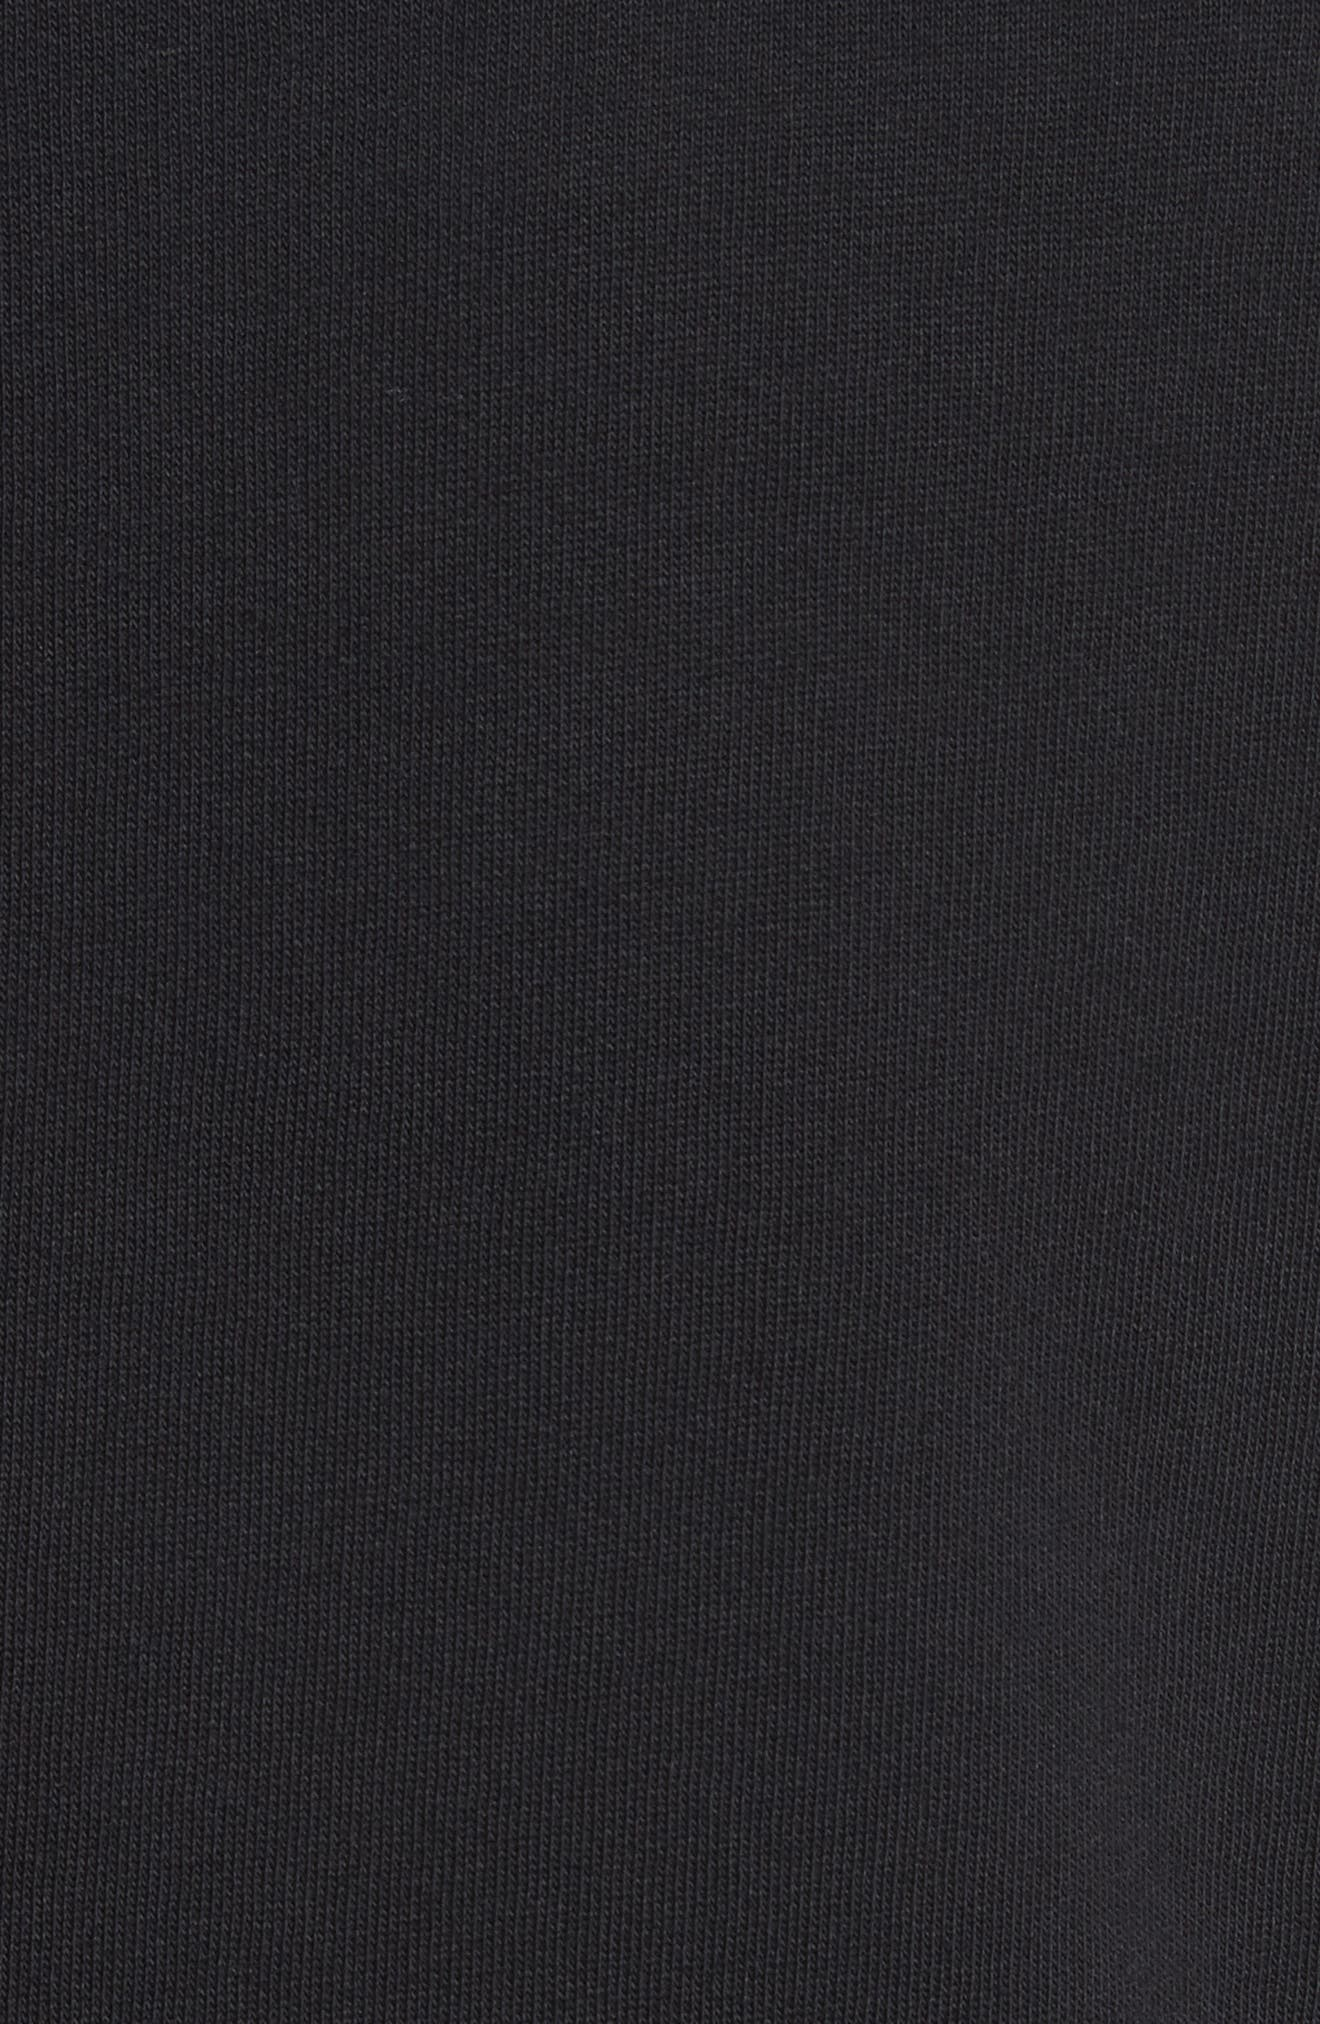 Stripe Trim Jersey Sport Coat,                             Alternate thumbnail 6, color,                             001